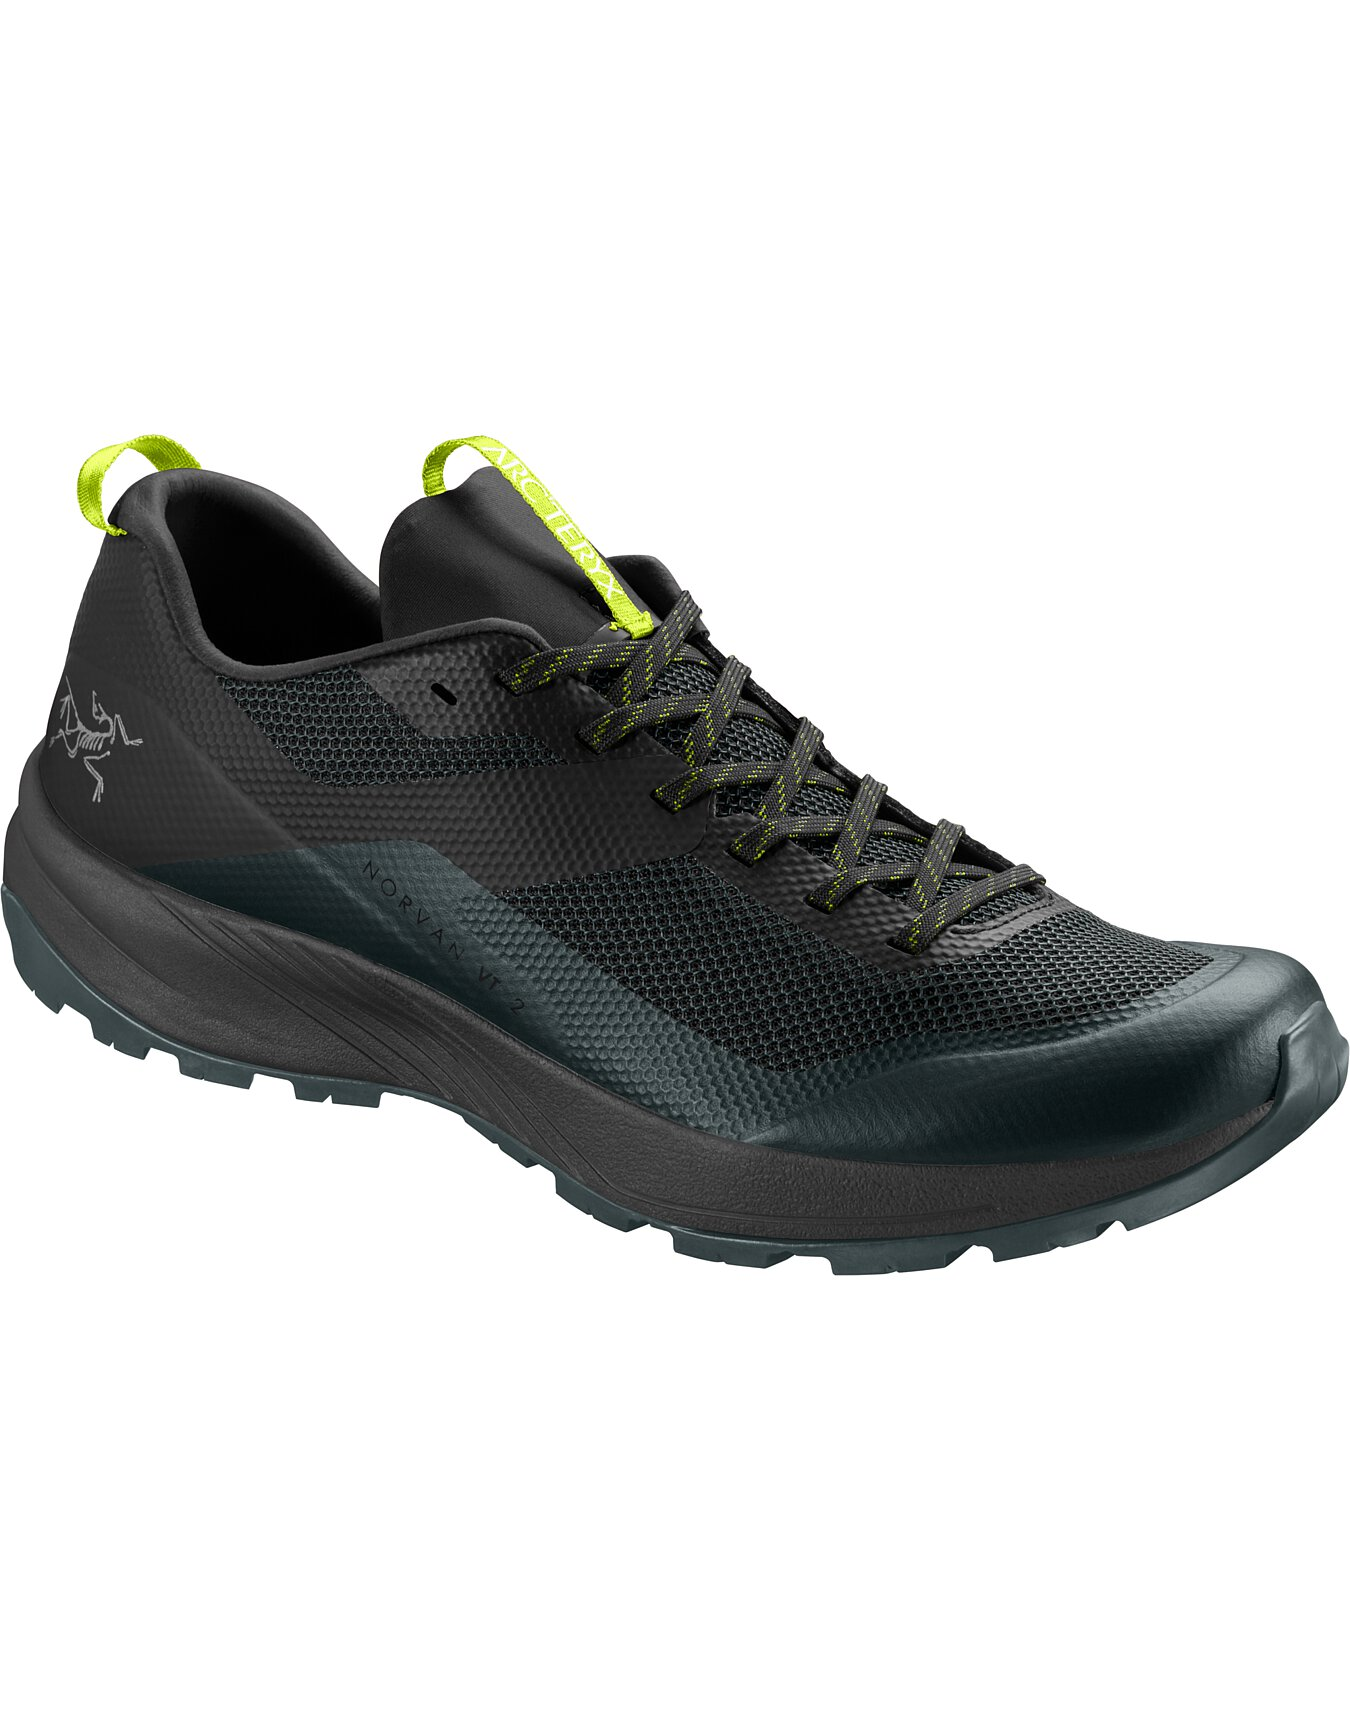 Norvan VT 2 GTX Shoe | Mens | Arc'teryx